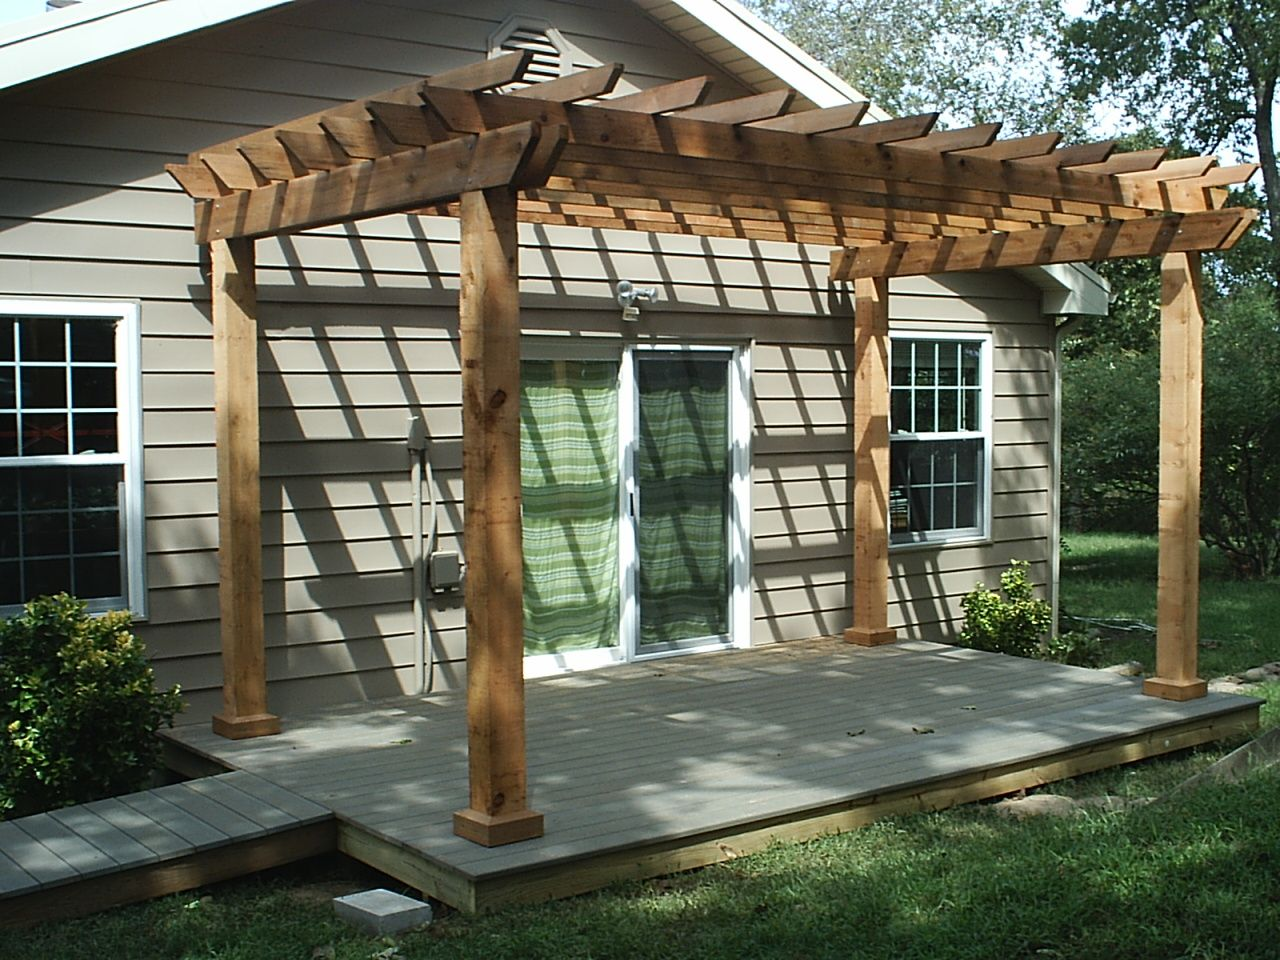 inspiring pergola plans for more beautiful yard ideas. Black Bedroom Furniture Sets. Home Design Ideas